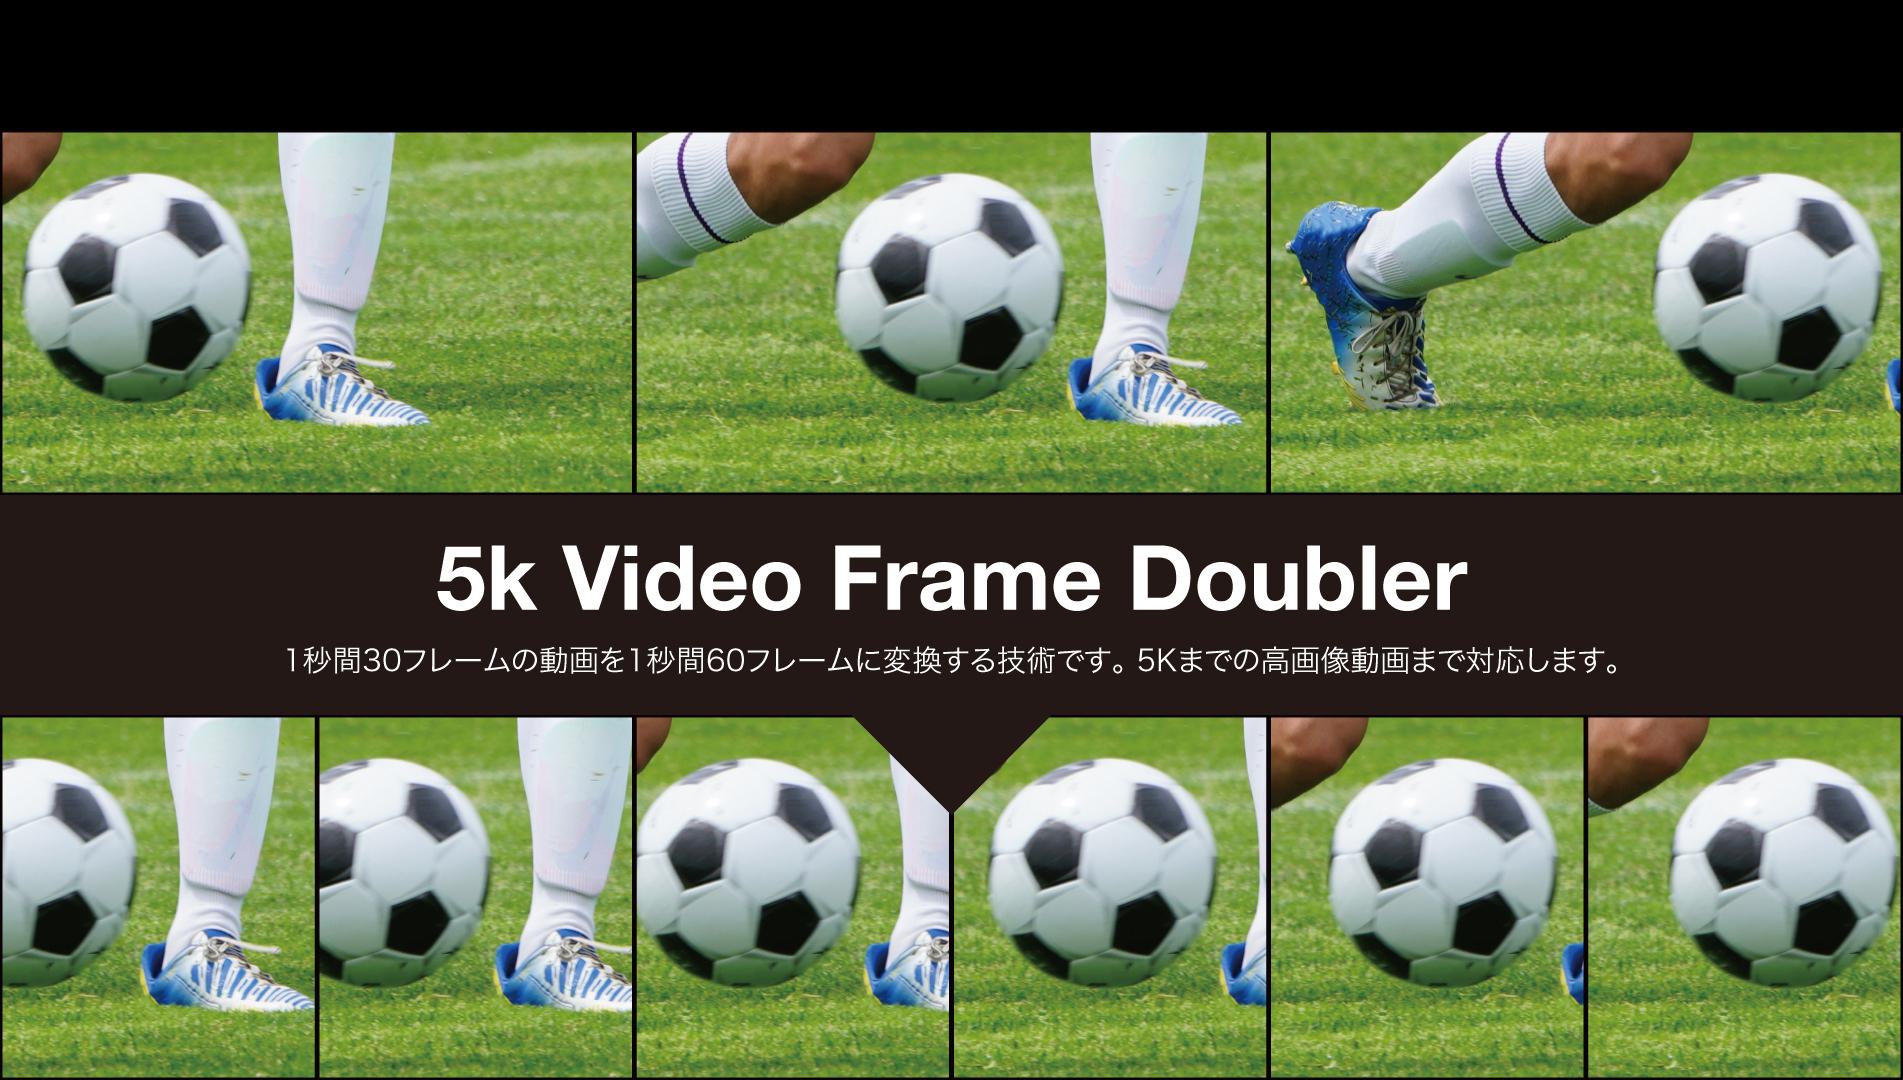 5k Video Frame Doubler